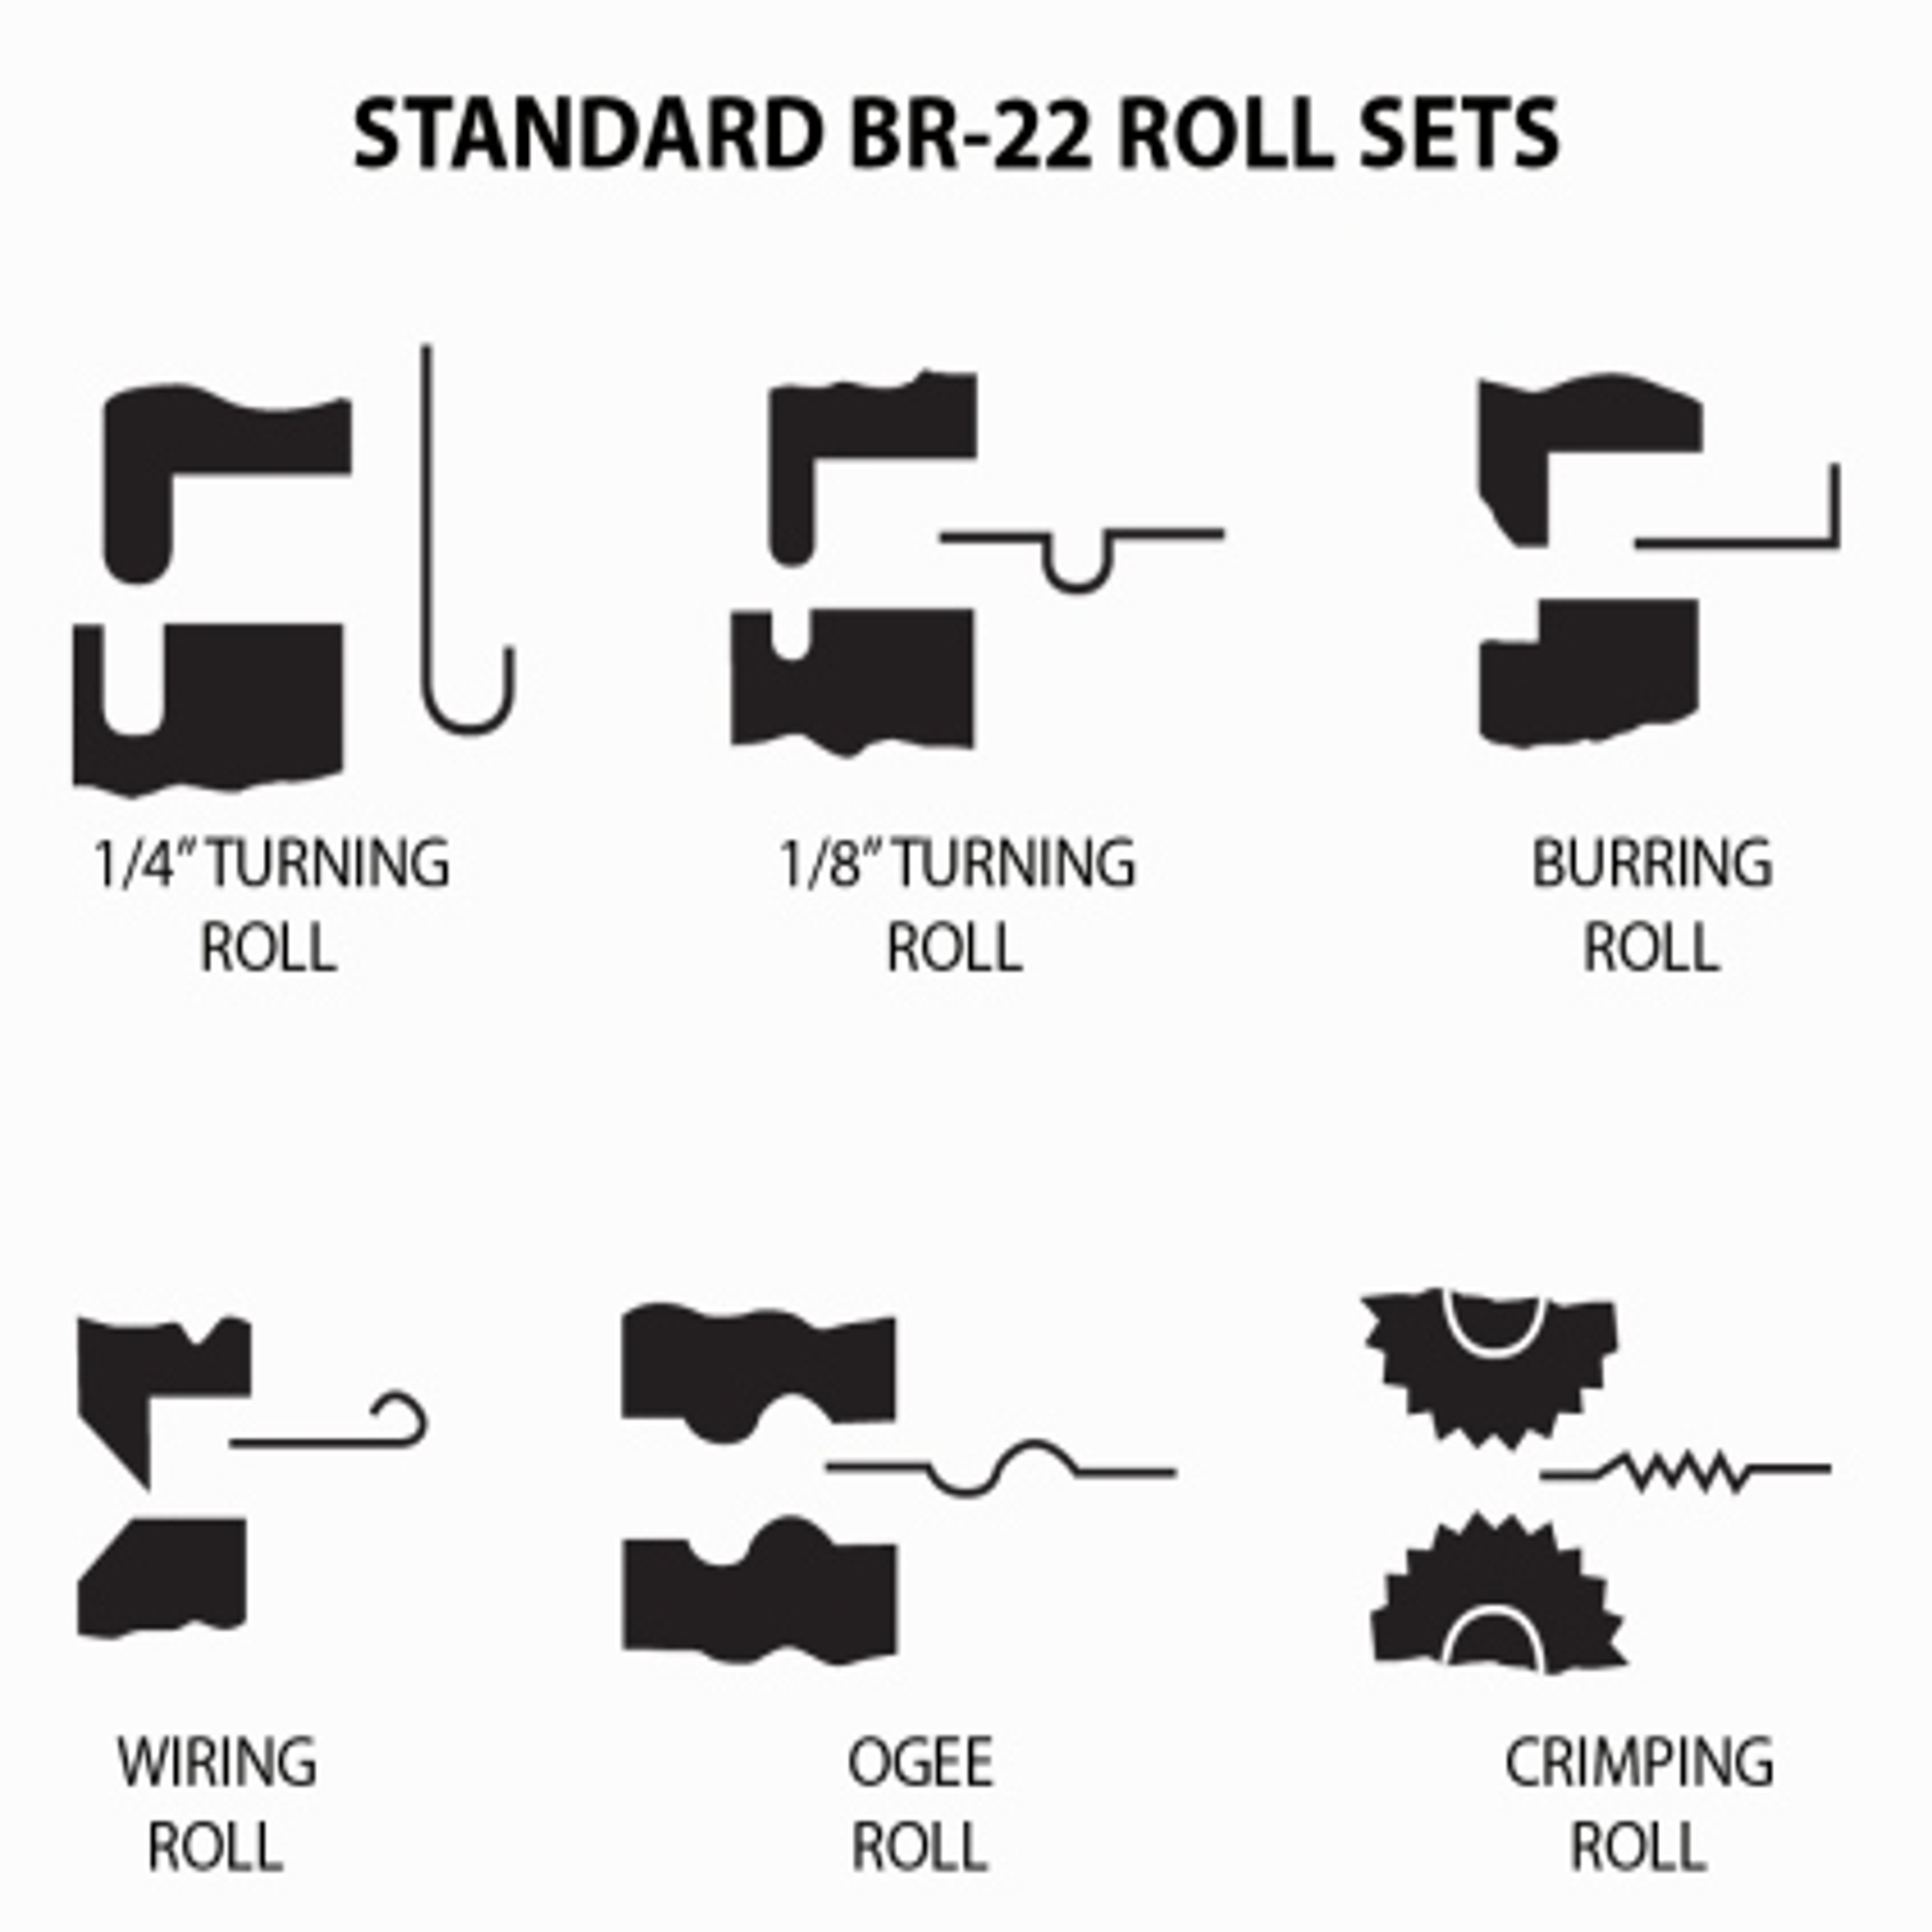 Bead Roller For Sale Watch Video Bead Roller